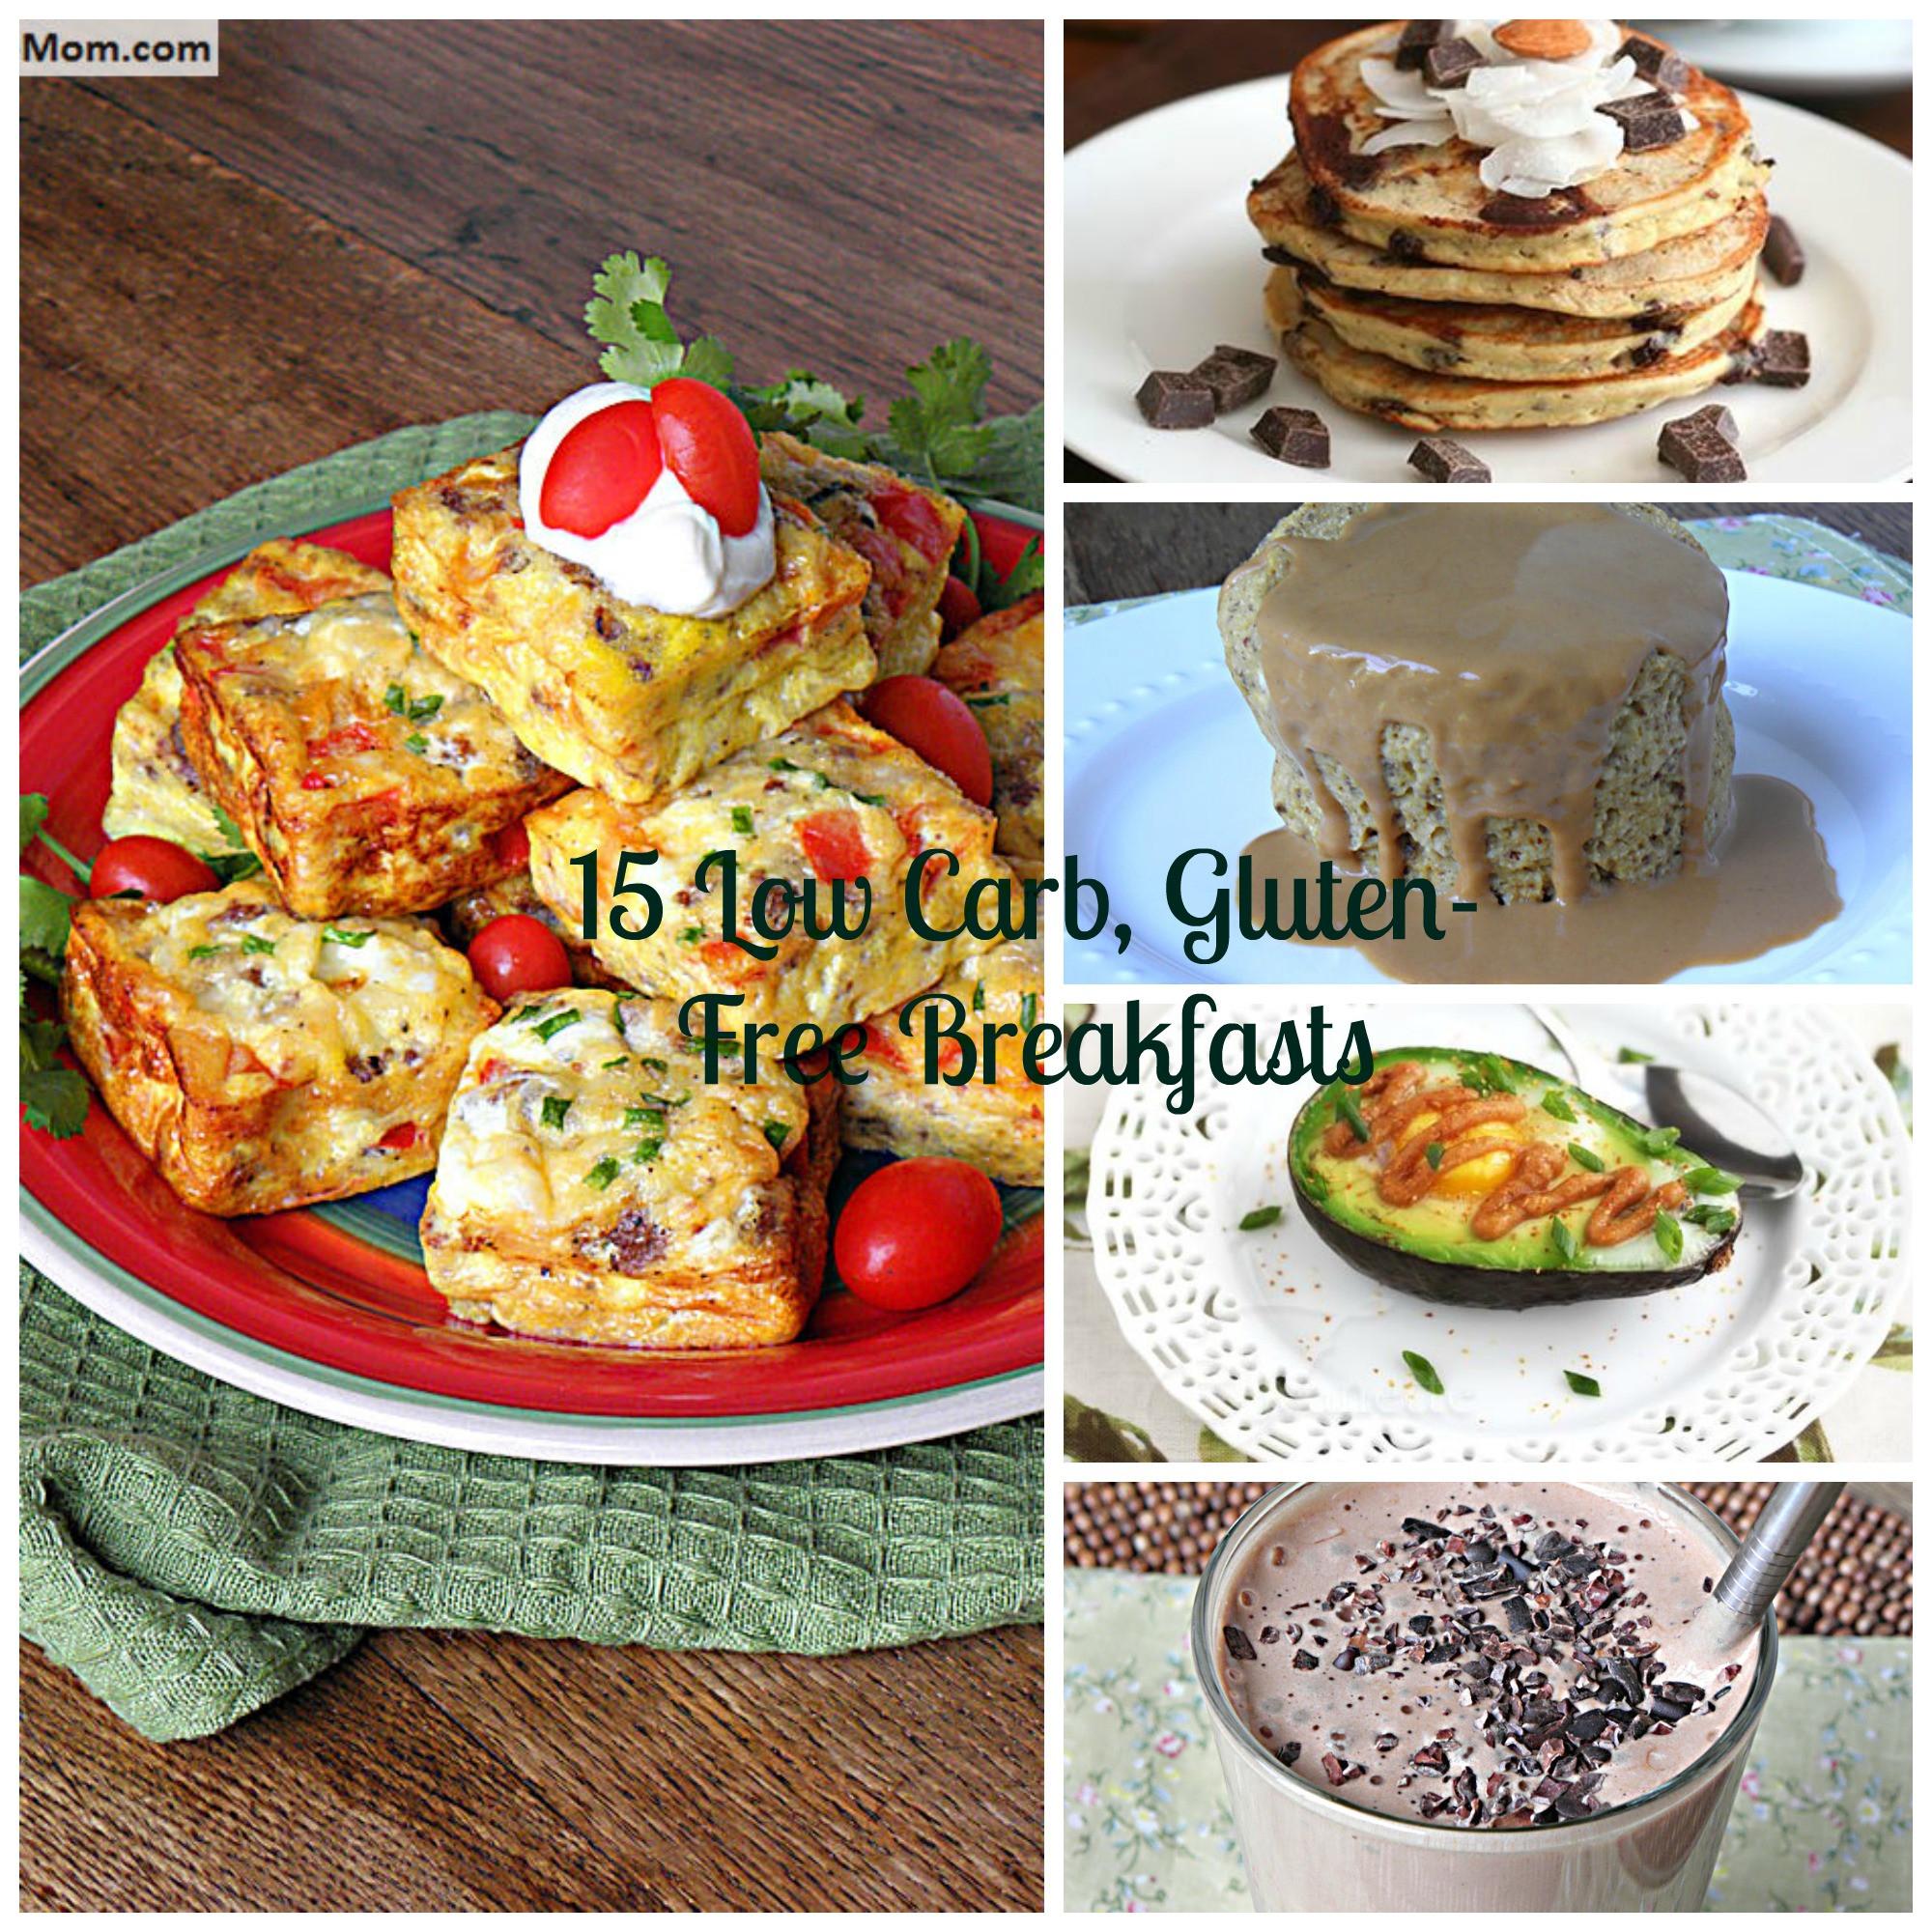 Diabetic Gourmet Recipes  15 Gluten Free Low Carb & Diabetic Friendly Breakfast Recipes